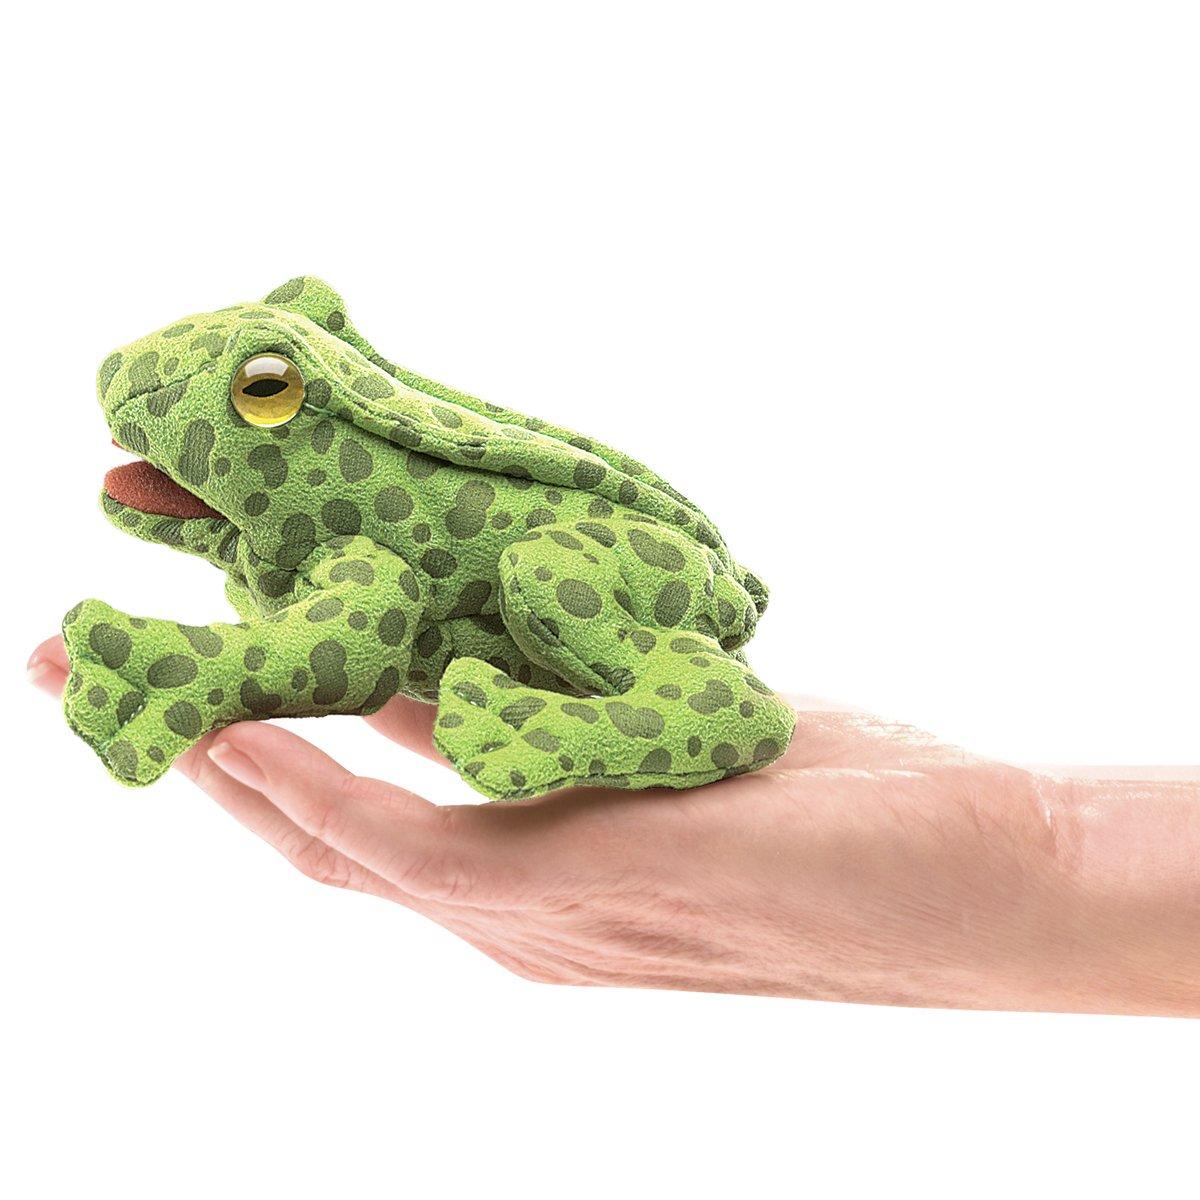 Folkmanis Mini Frog Finger Puppet Plush Folkmanis Puppets 2761